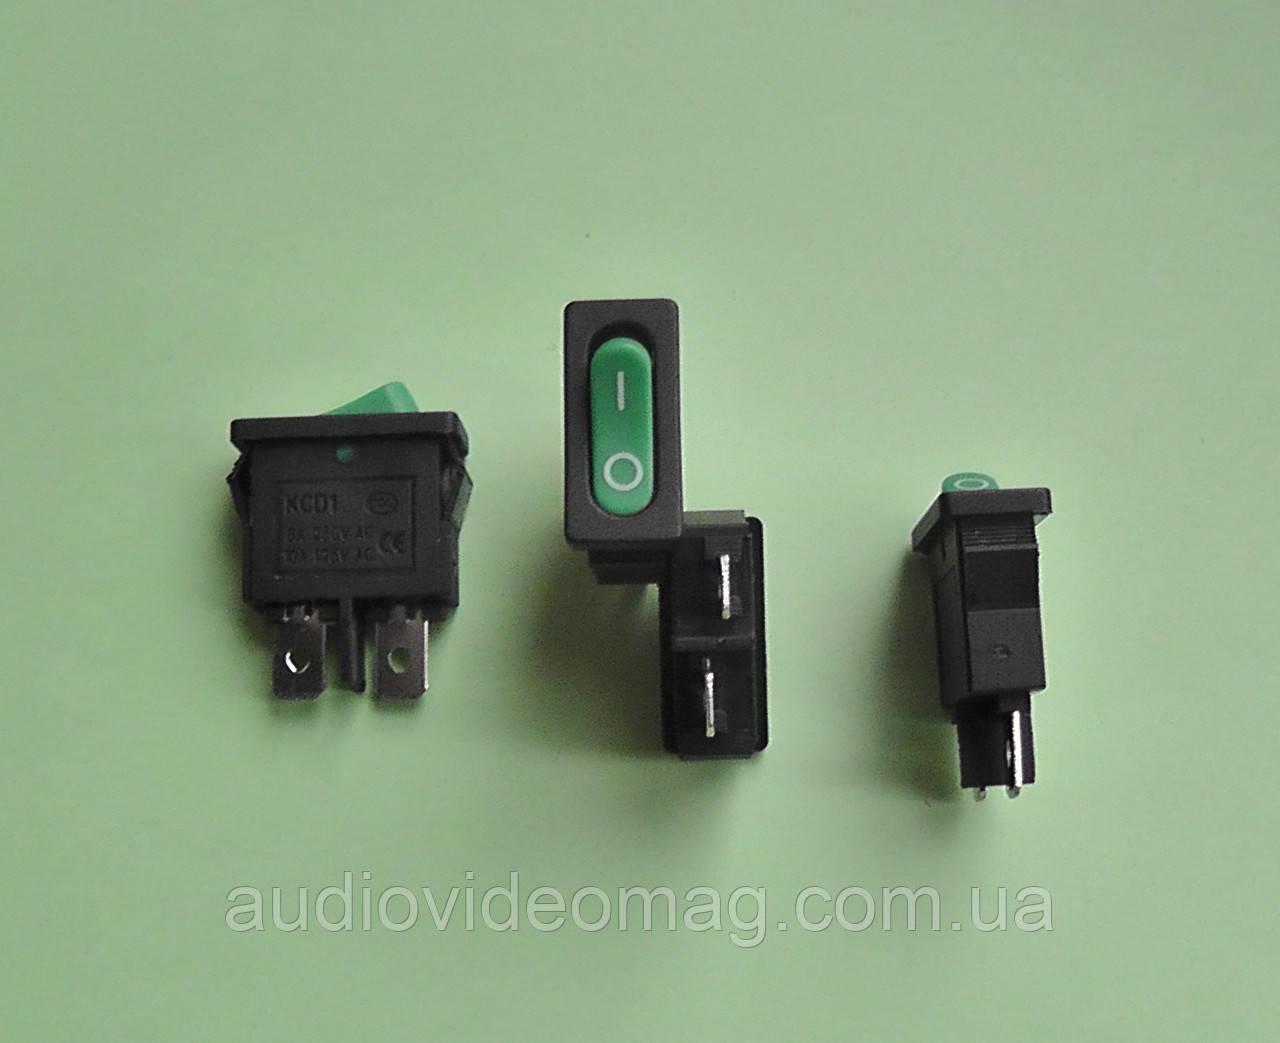 Переключатель клавишный KCD1 250V 6A, зеленый 18.8 х 6.5мм